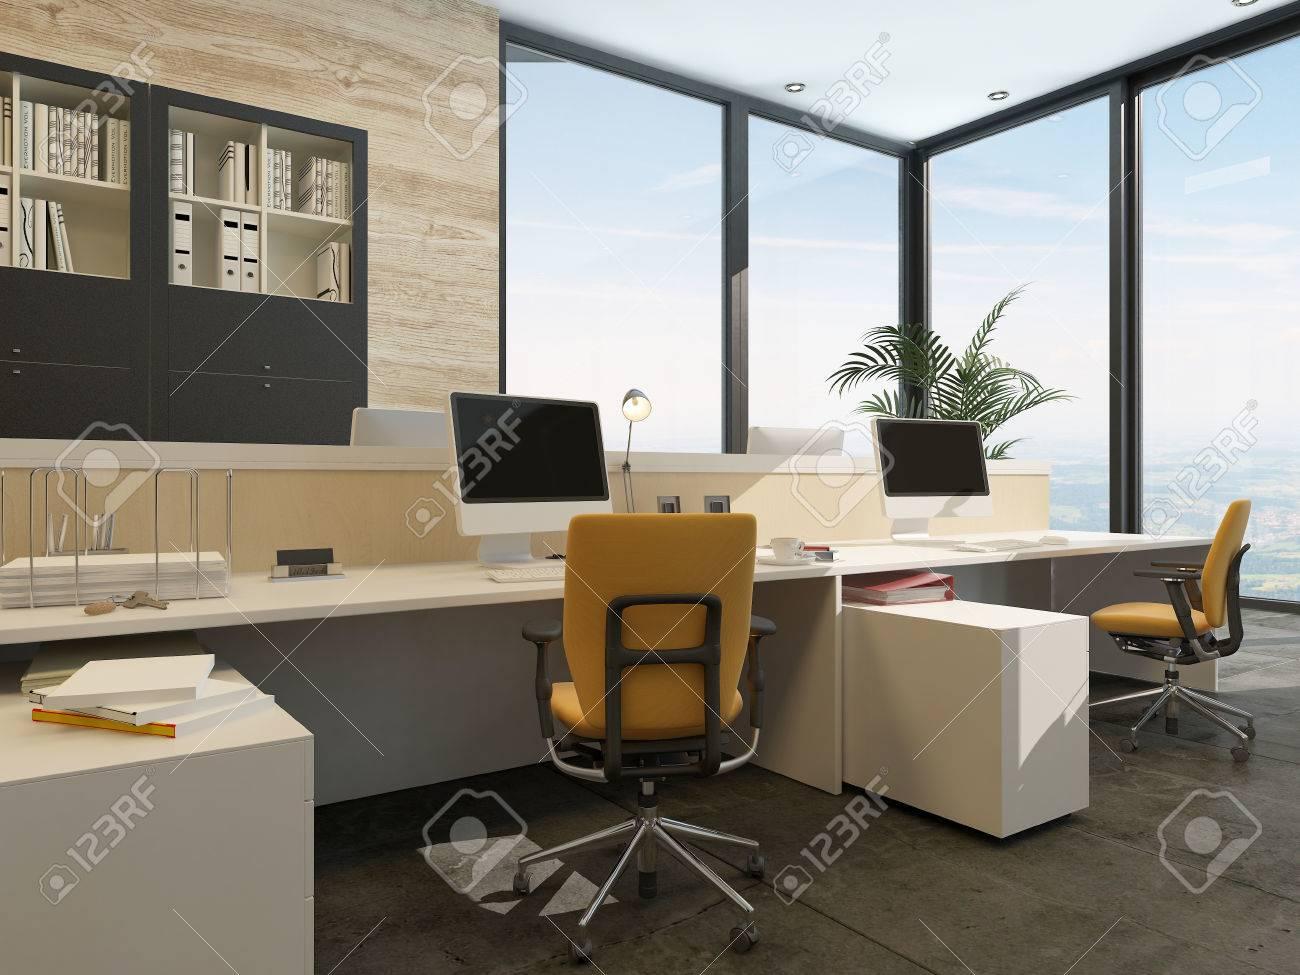 Bureaux moderne. cool bureaux moderne with bureaux moderne. great